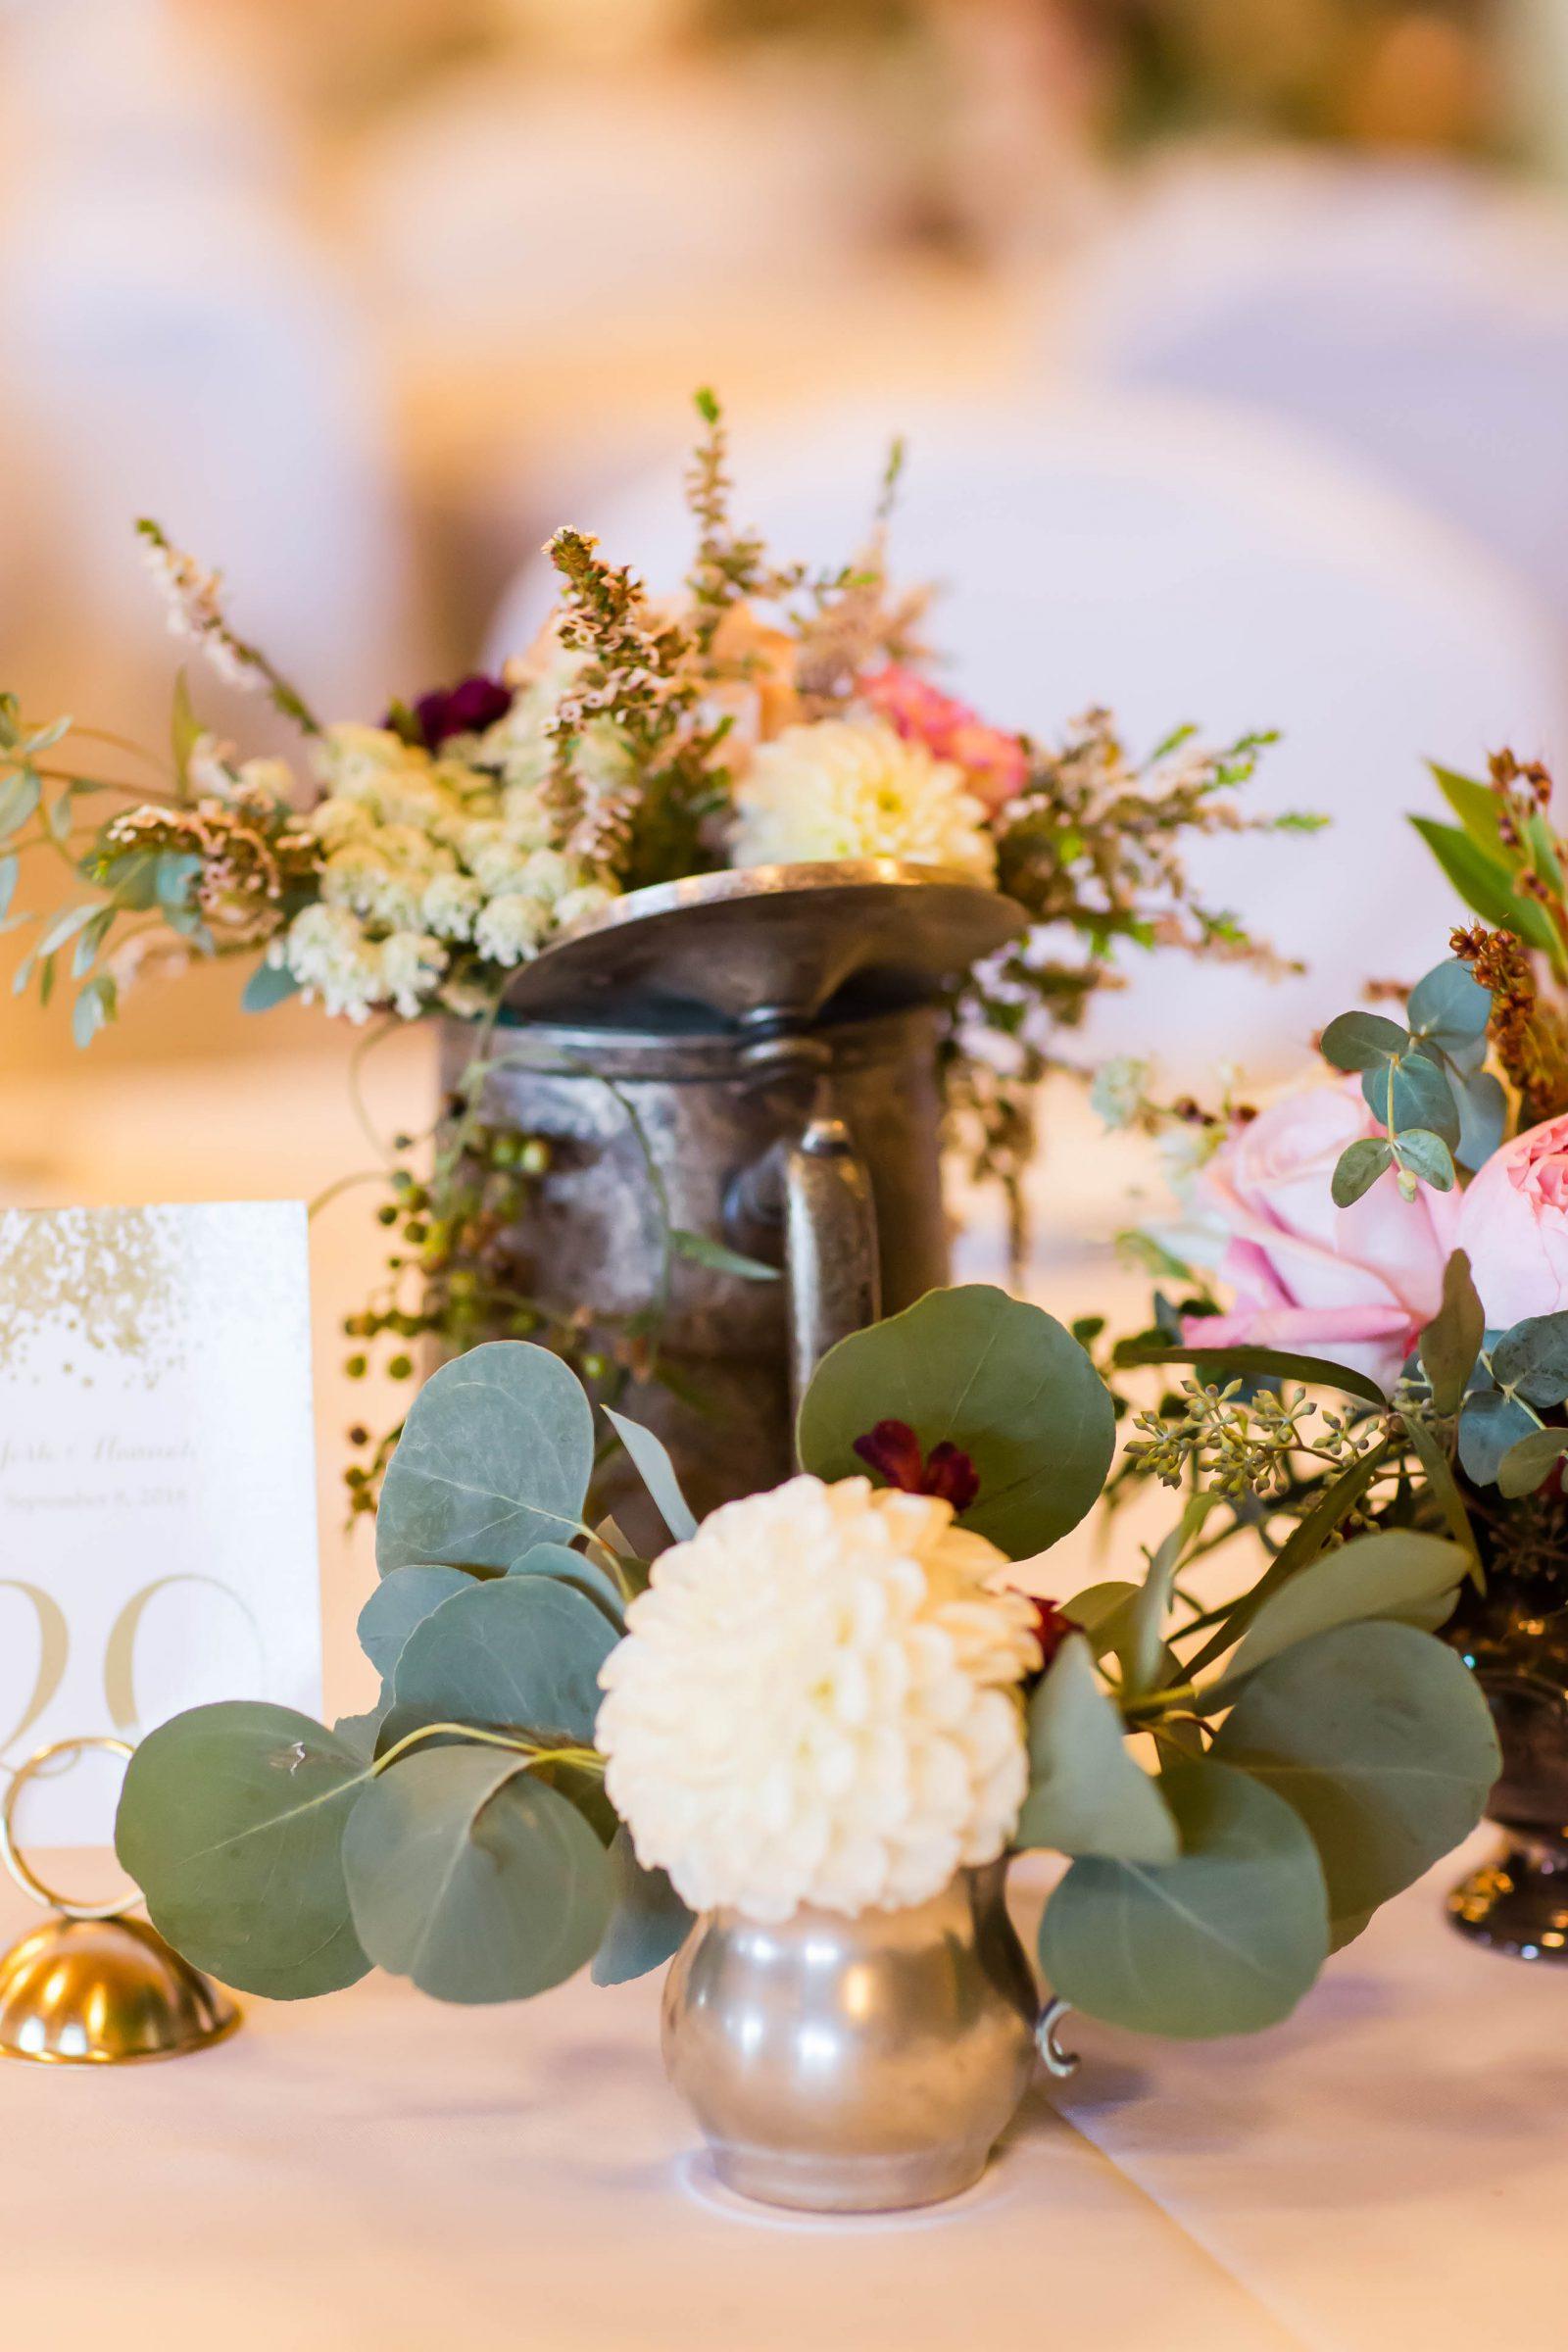 sunny-hill-wedding-venue-loren-jackson-photography-35